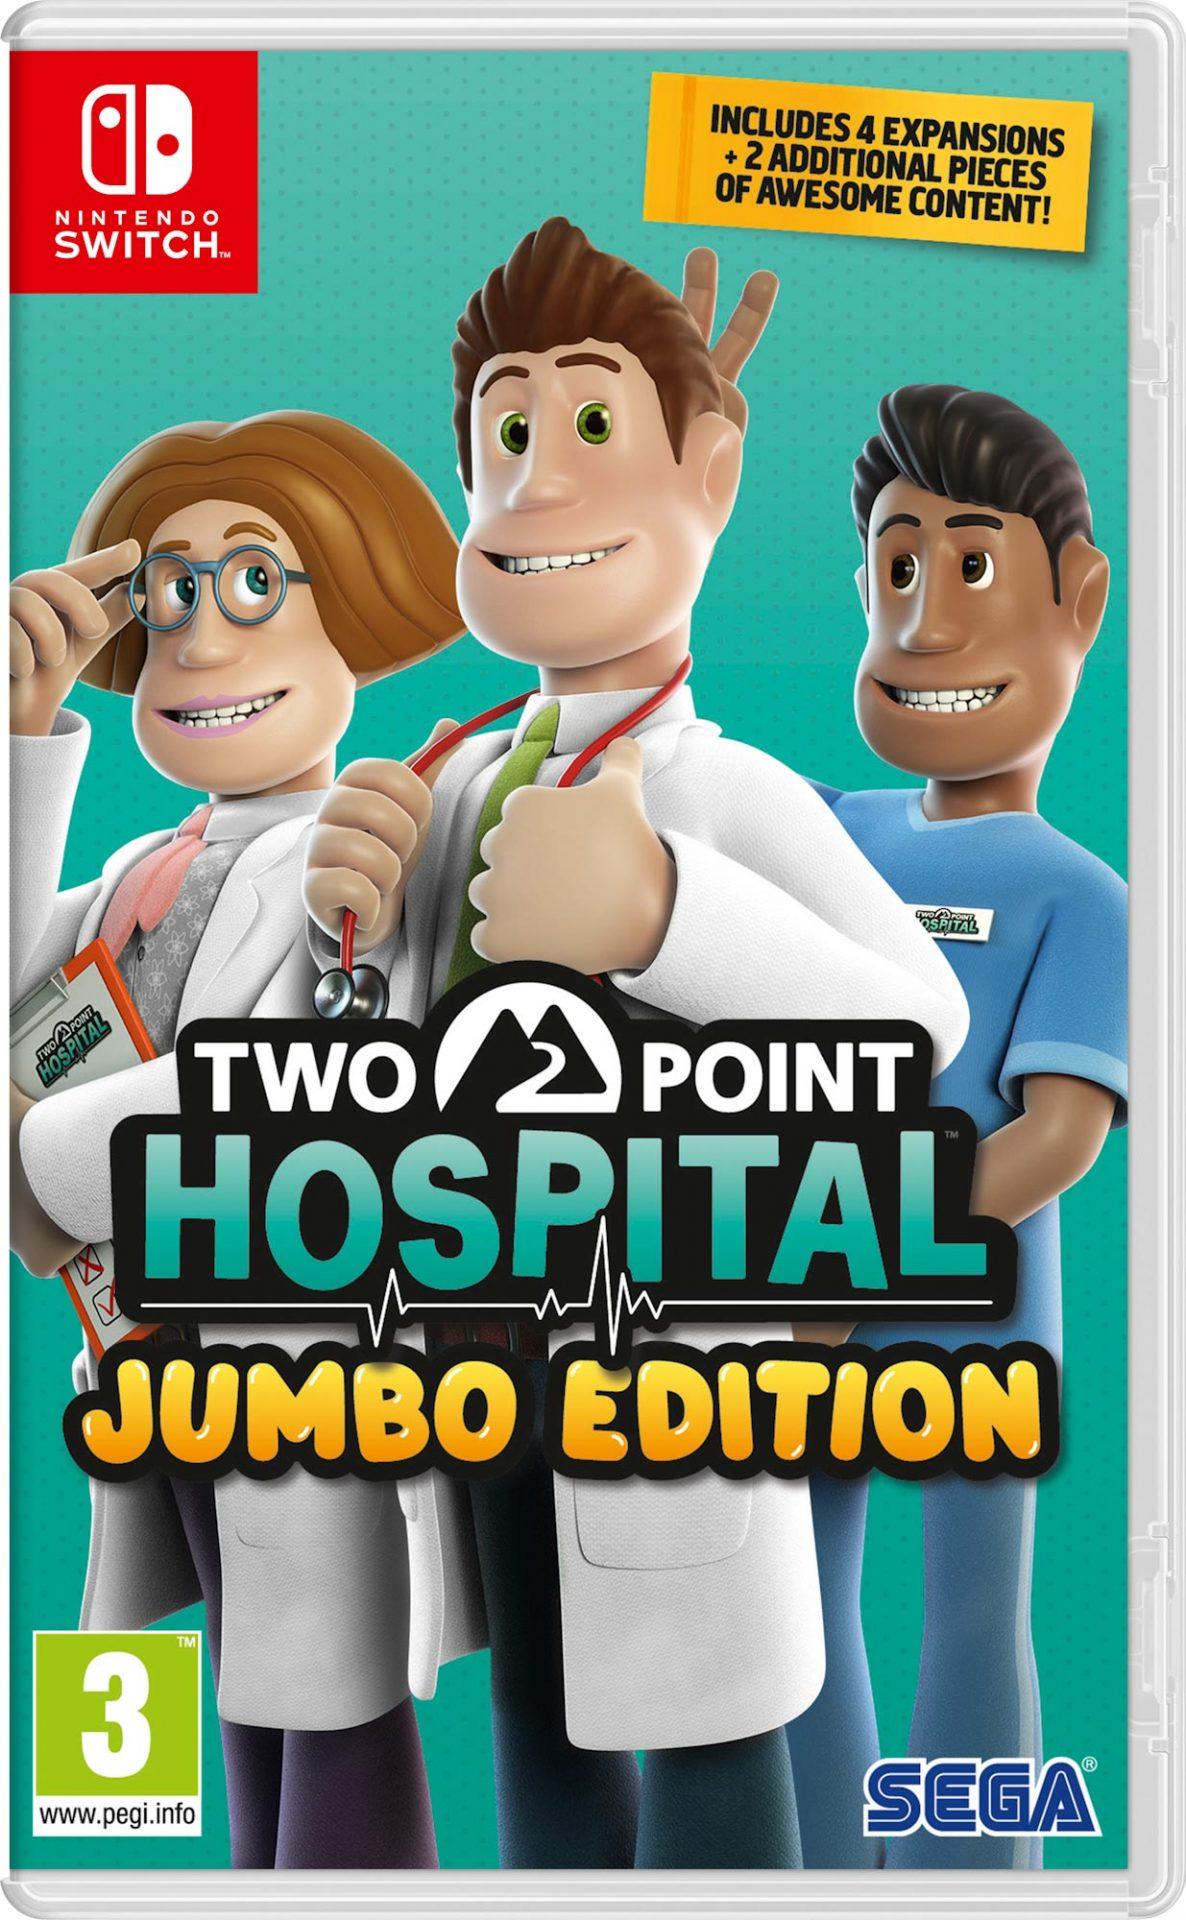 Two Point Hospital - Jumbo Edition Switch - SEGA 1.10.01.21.012